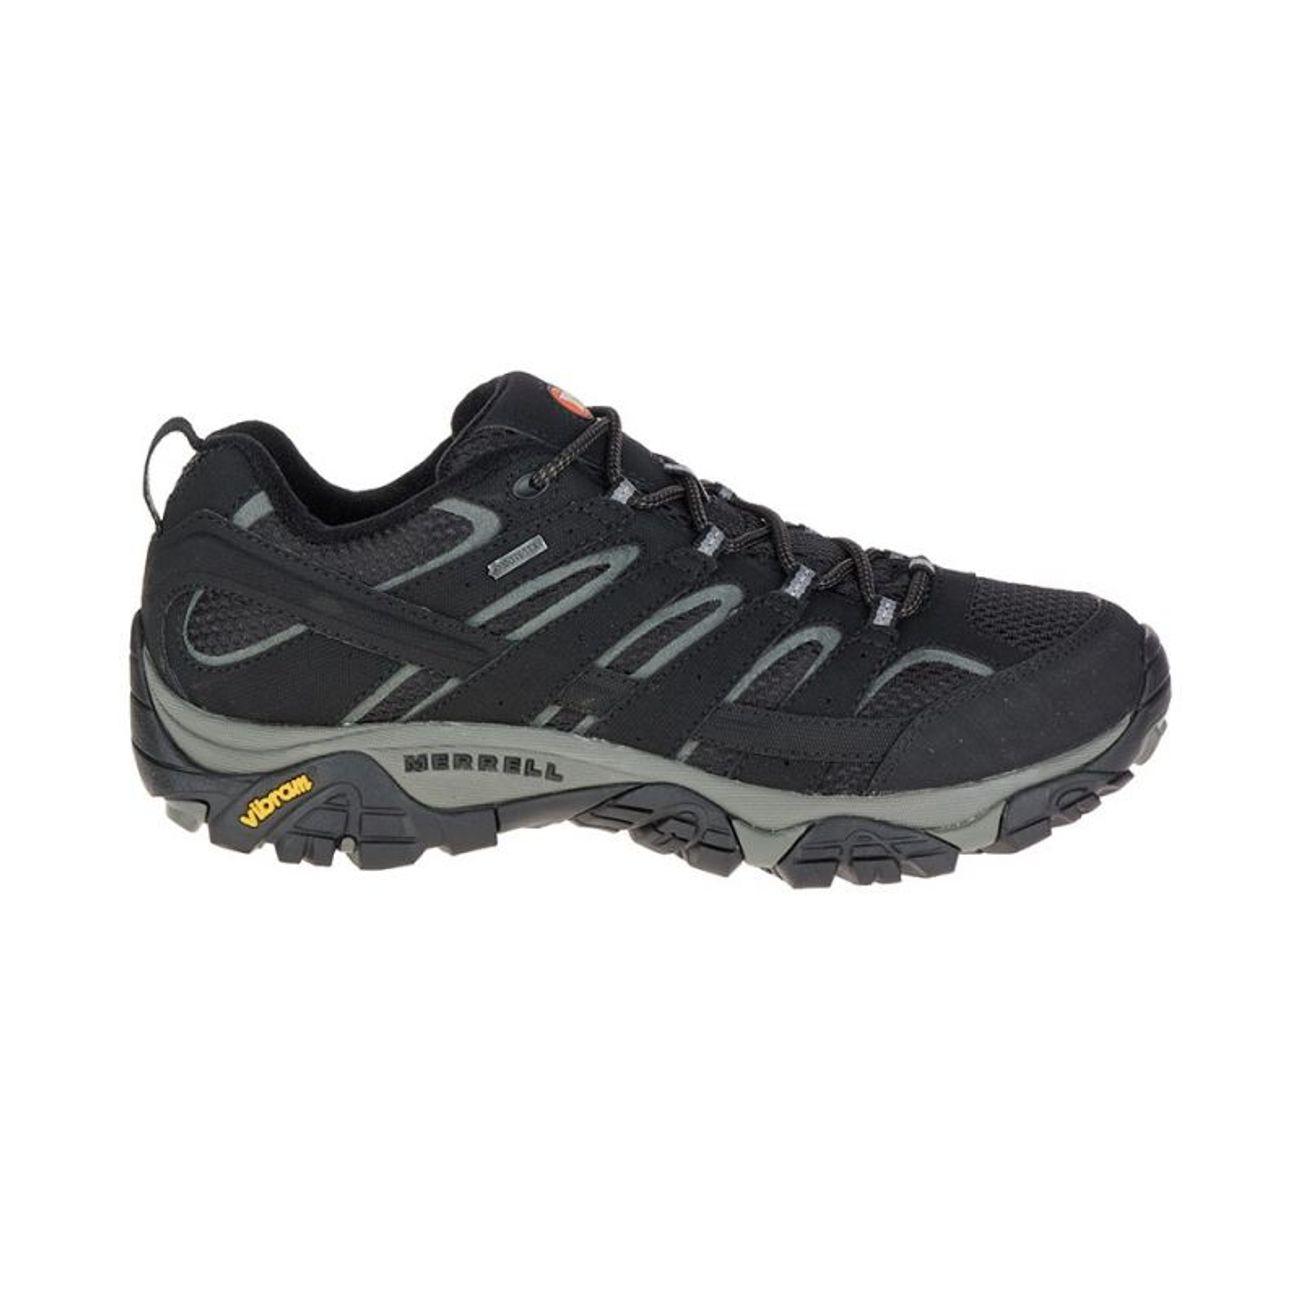 De Chaussures Noir Homme Merrell Gtx Alpinisme 2 Moab Marche tshrxQCd